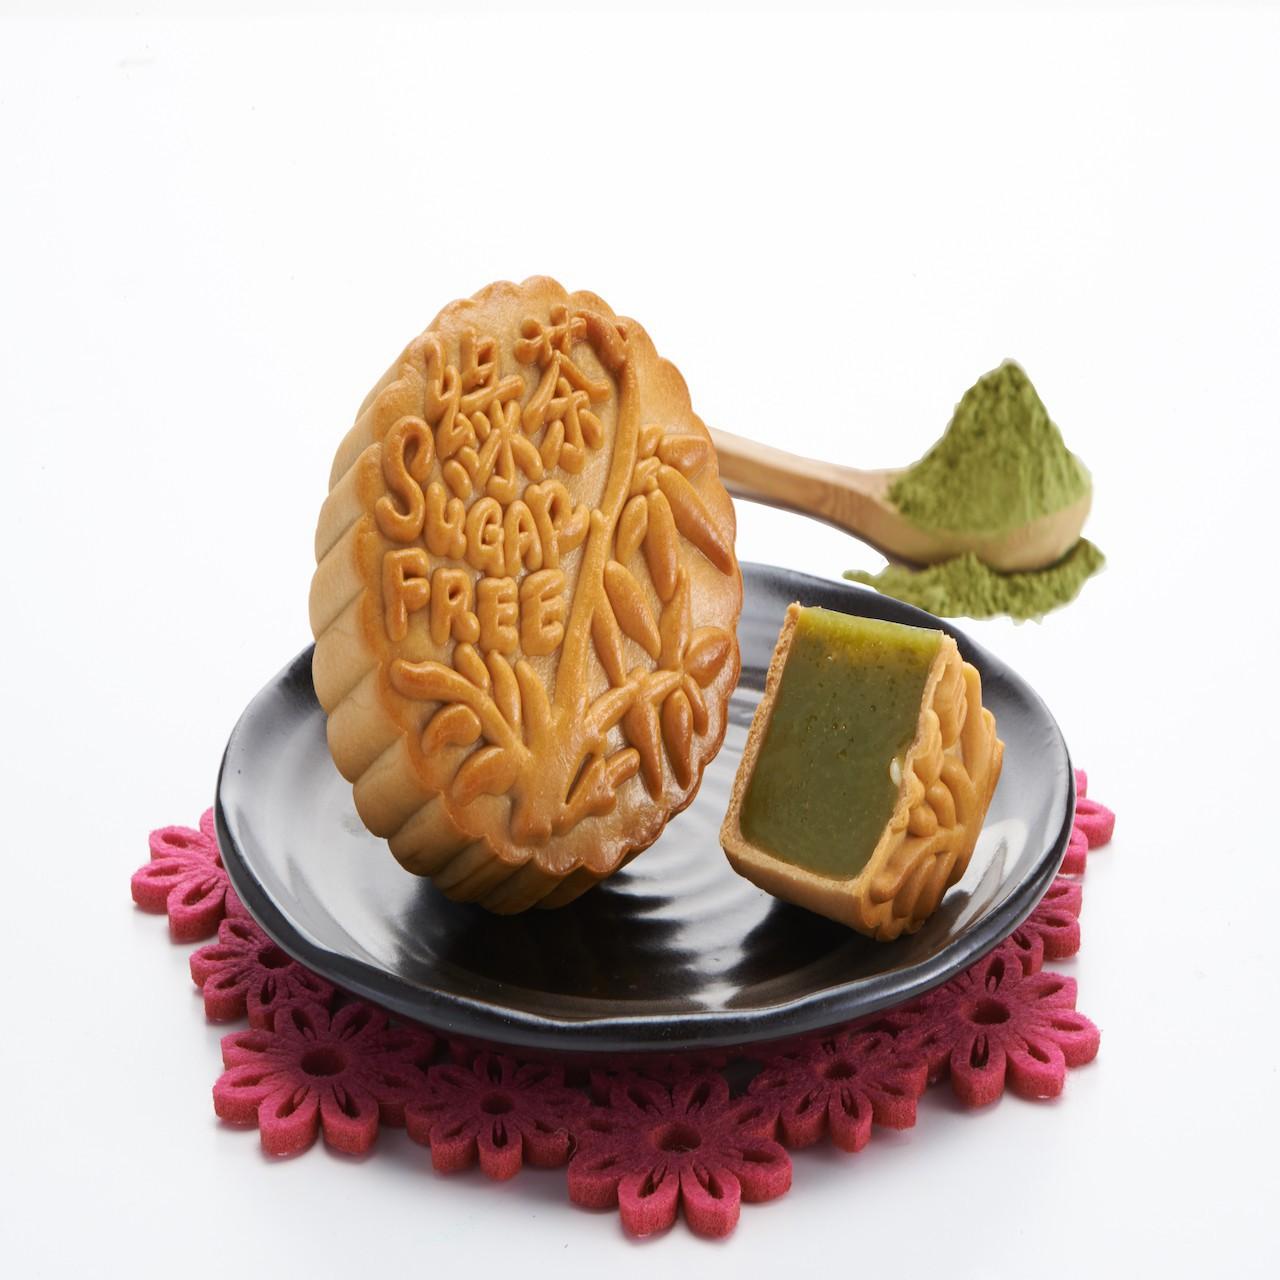 [Ready Stock] Mooncake Sugar Free Fresh Pandan Pure Lotus Paste Halal Tong Wah Moon Cake With Gift Box 2 Pcs 无糖原